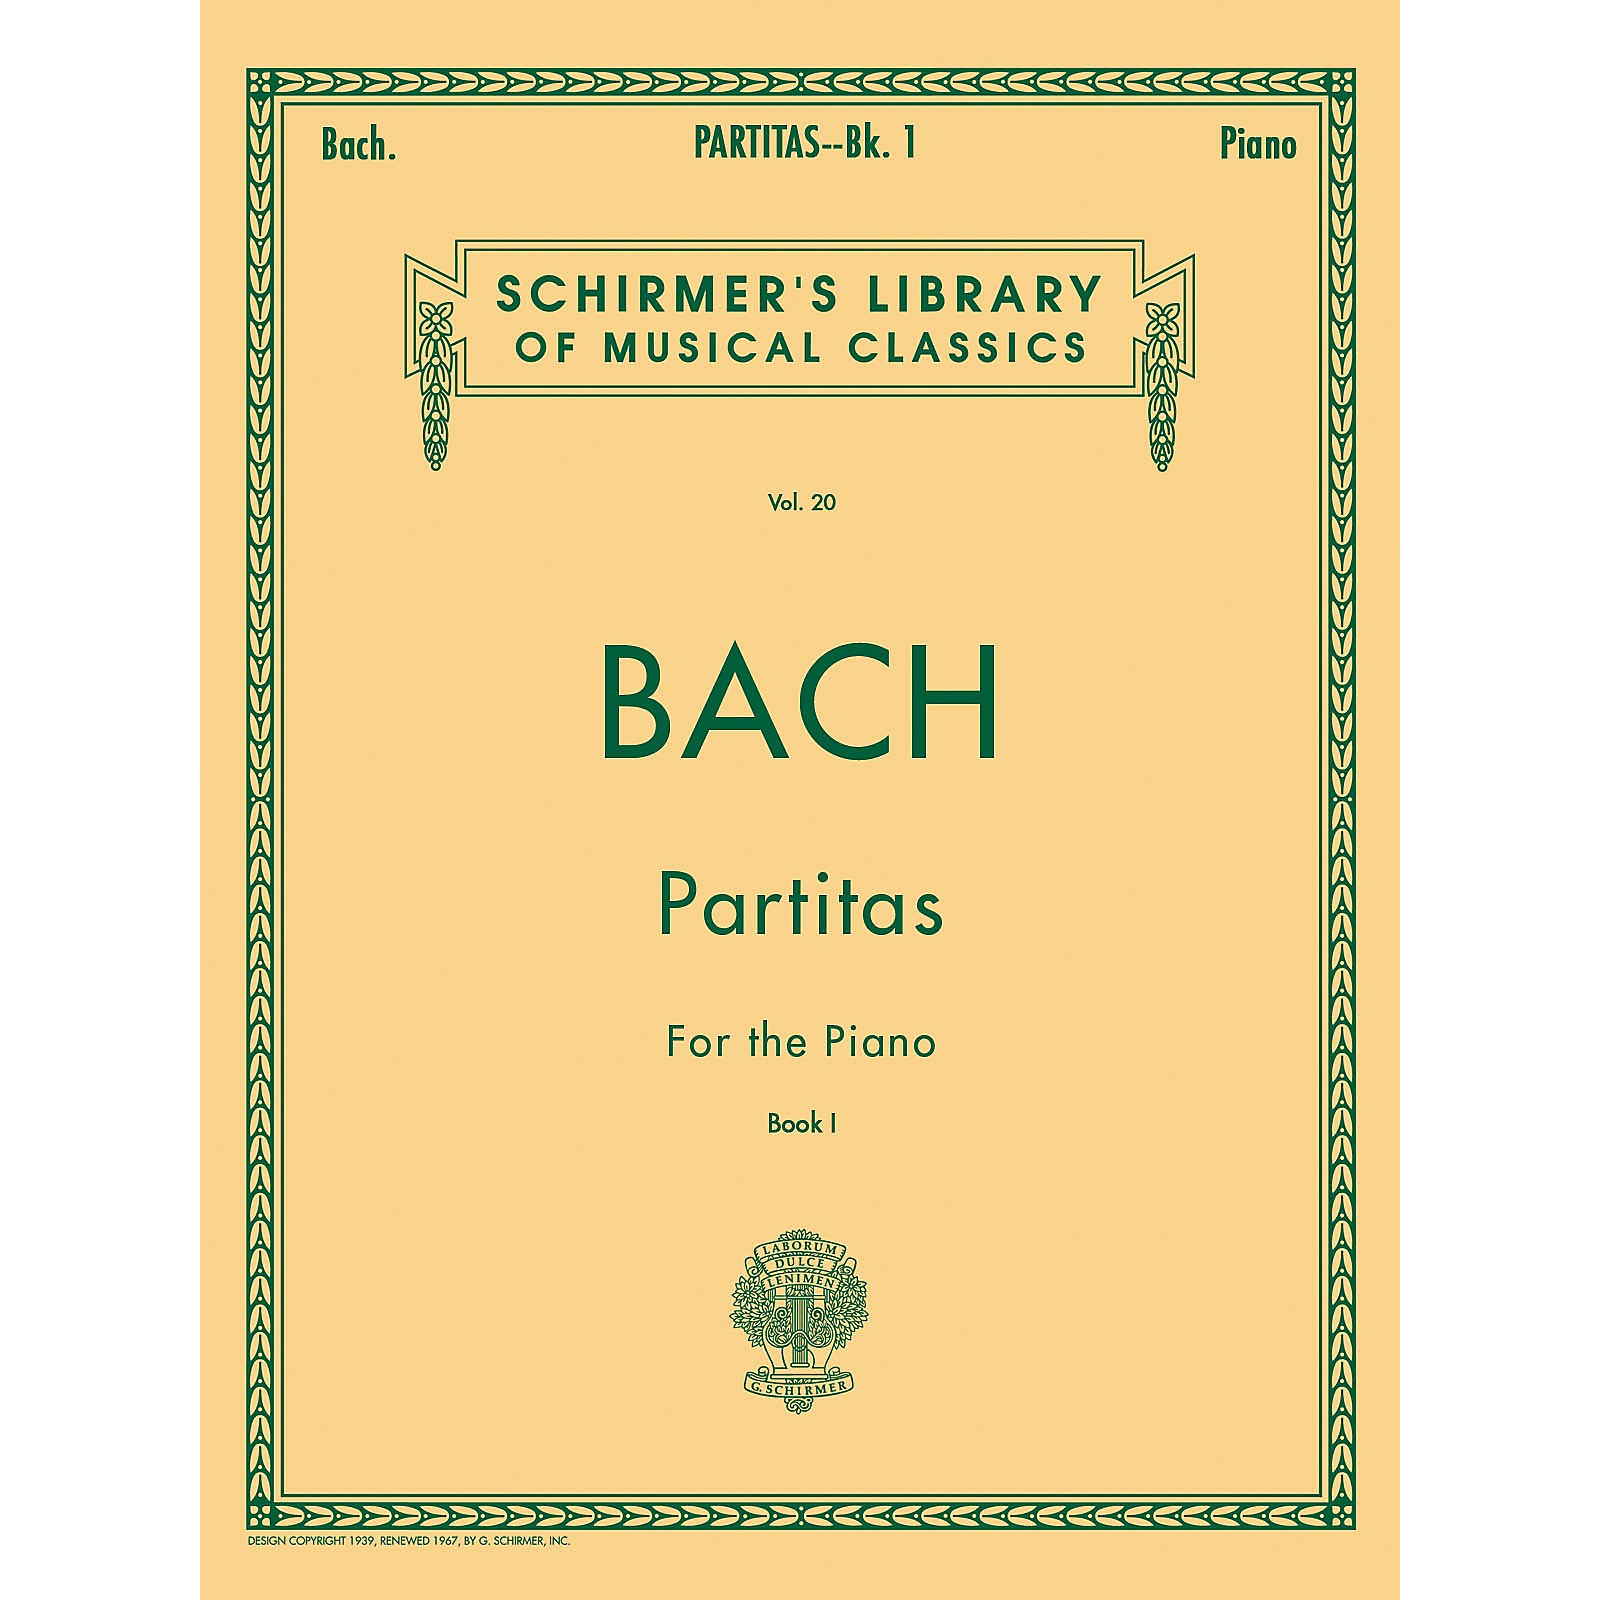 G. Schirmer Partitas for Piano Book 1 Nos 1-3 By Bach